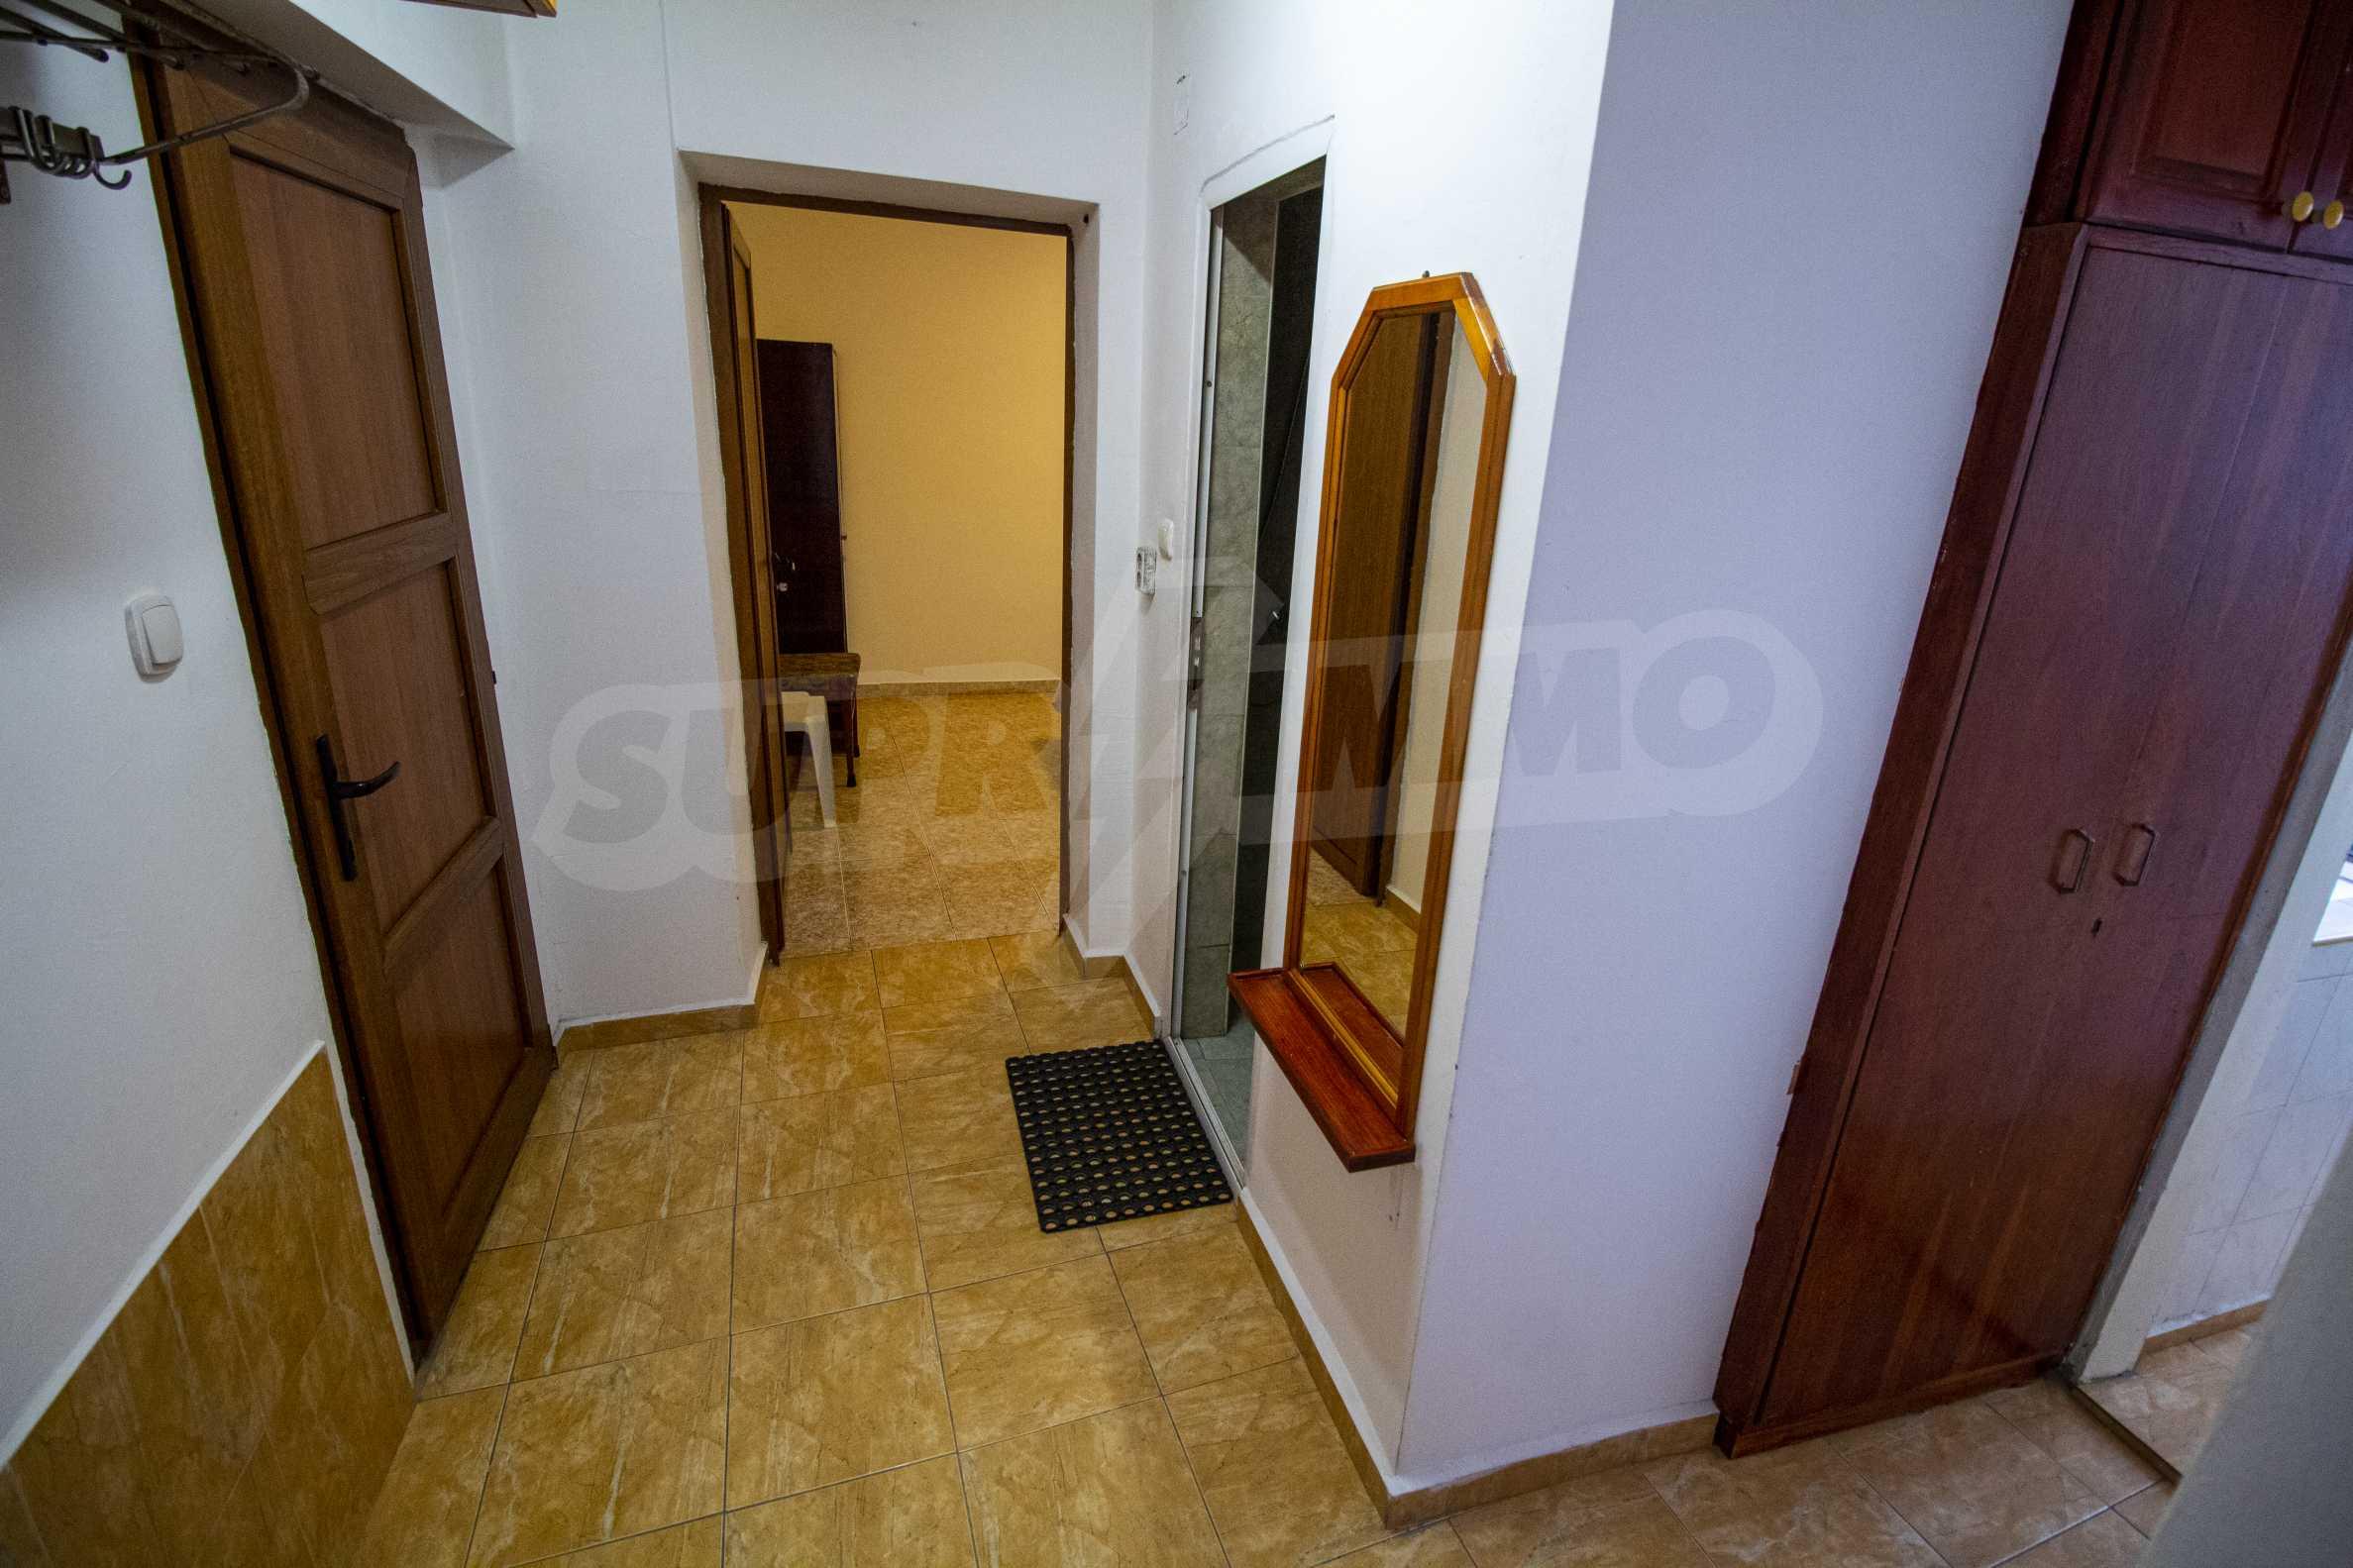 No maintenance fee. Two-bedroom apartment near the beach MMC Primorsko 2